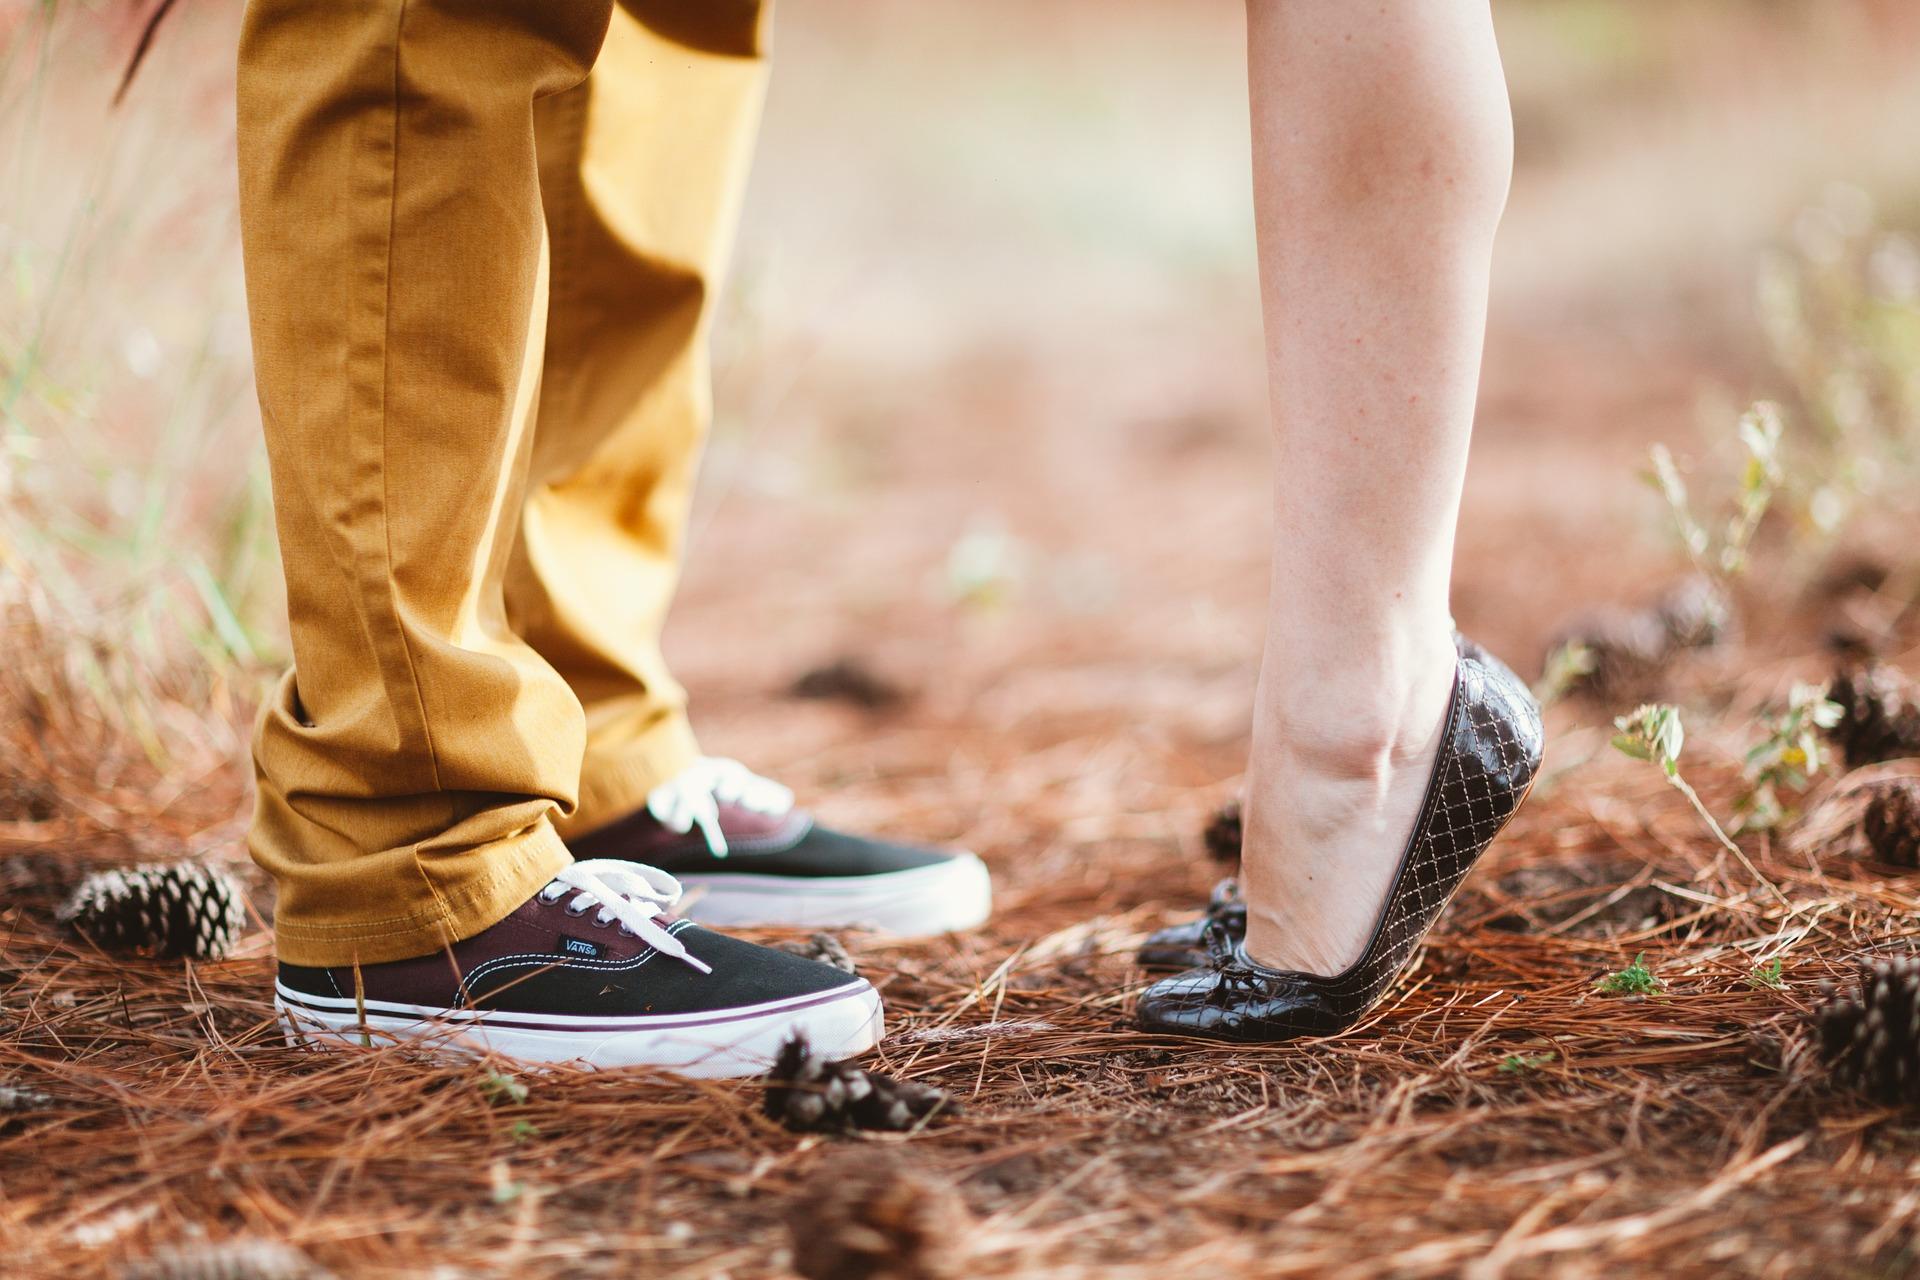 feet-1779064_1920.jpg